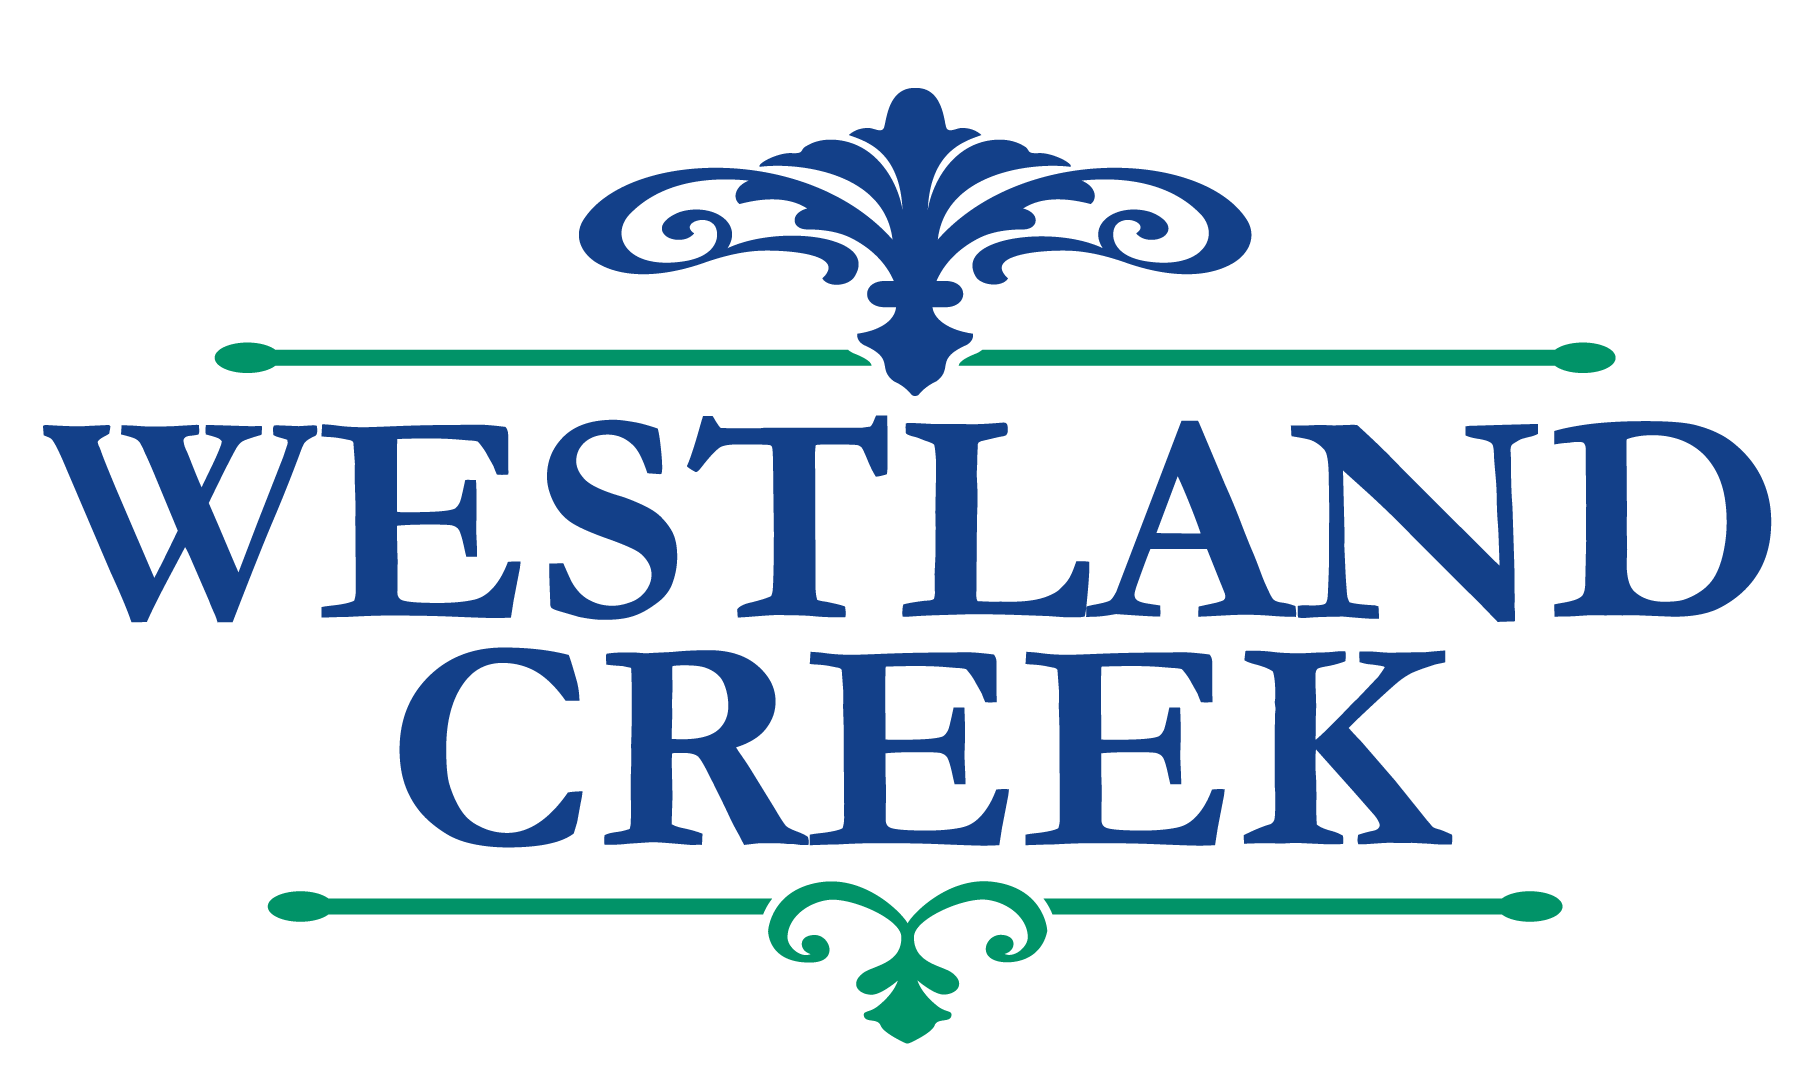 Westland Creek